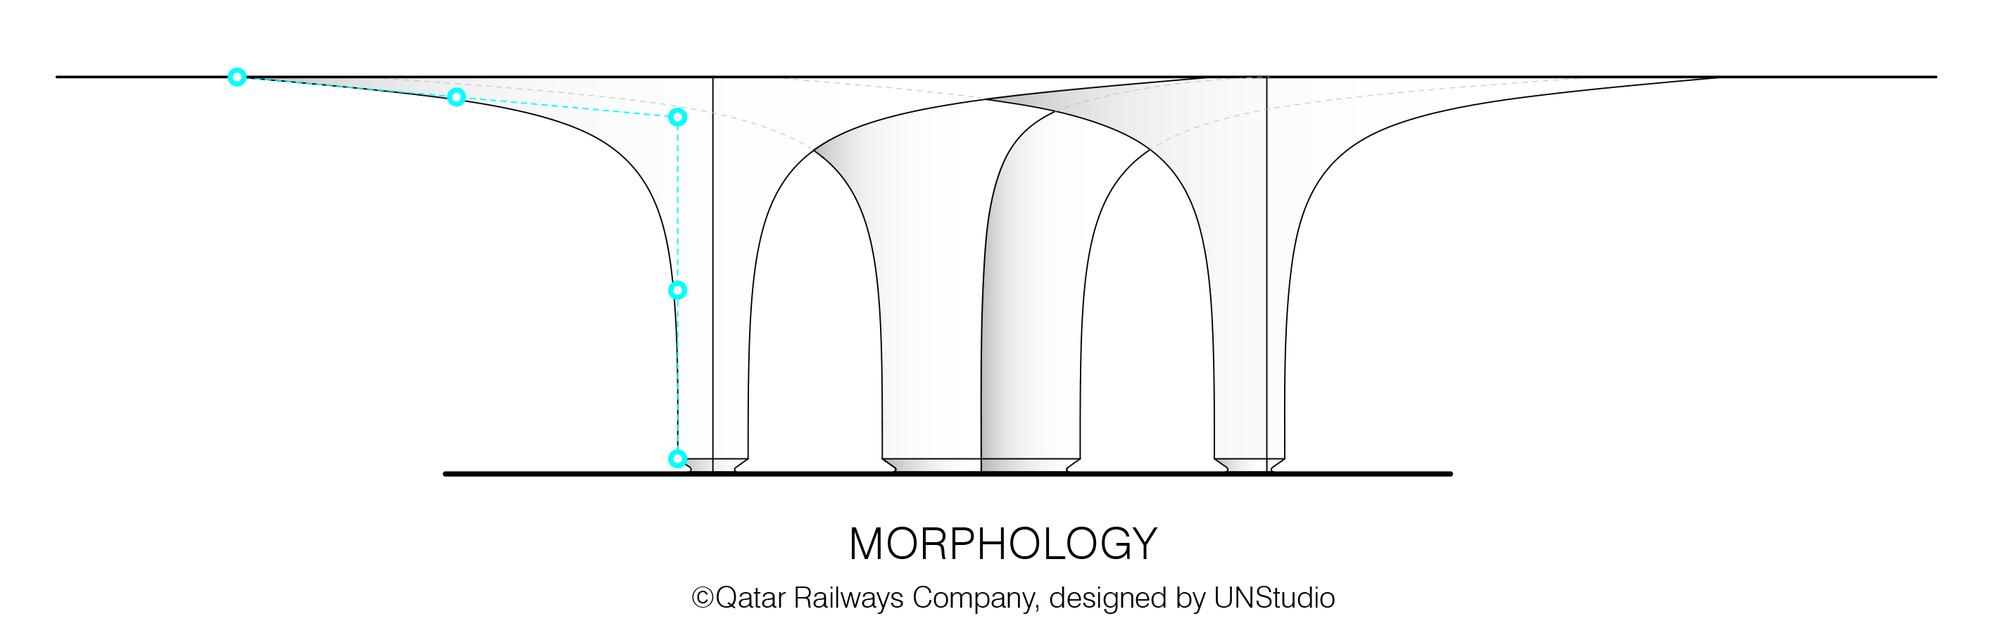 16_2-morphology_©Qatar_Railways_Company.jpg